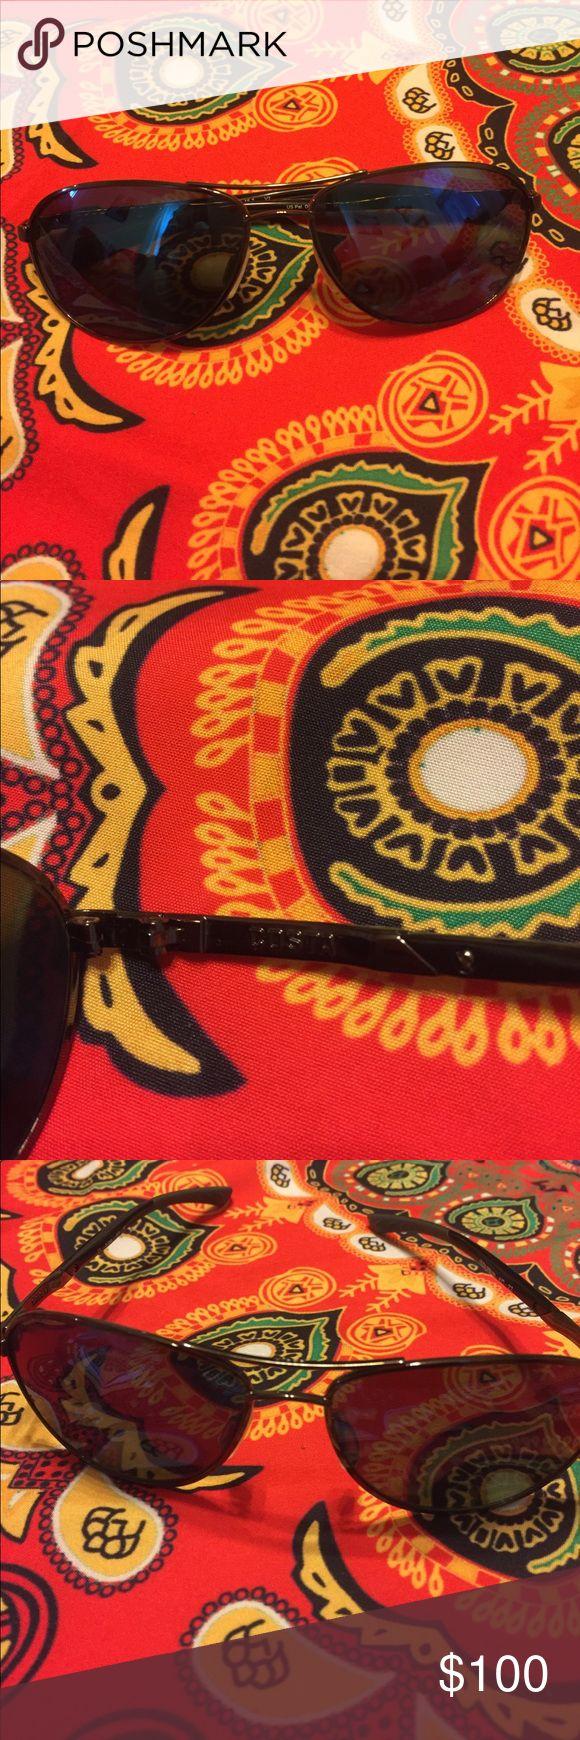 19 best Costa Sunglasses images on Pinterest | Costa sunglasses ...